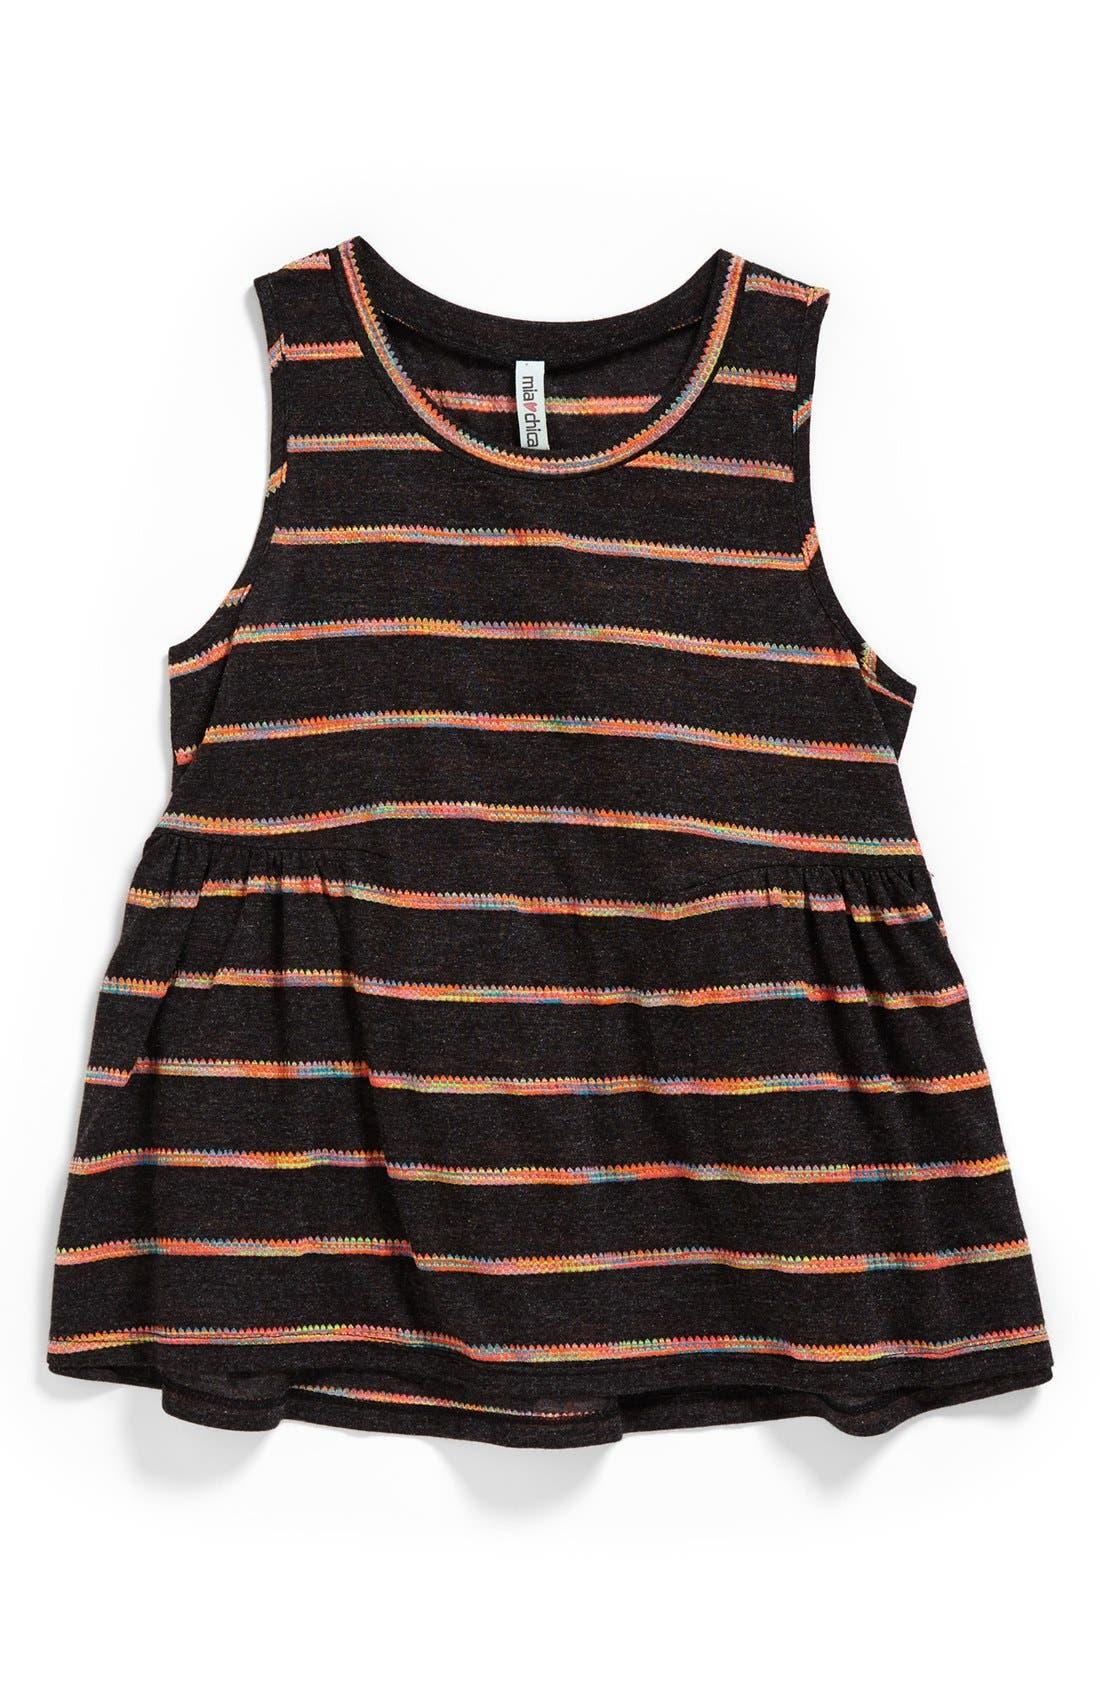 Main Image - Mia Chica Space Dye Stripe Top (Little Girls & Big Girls)